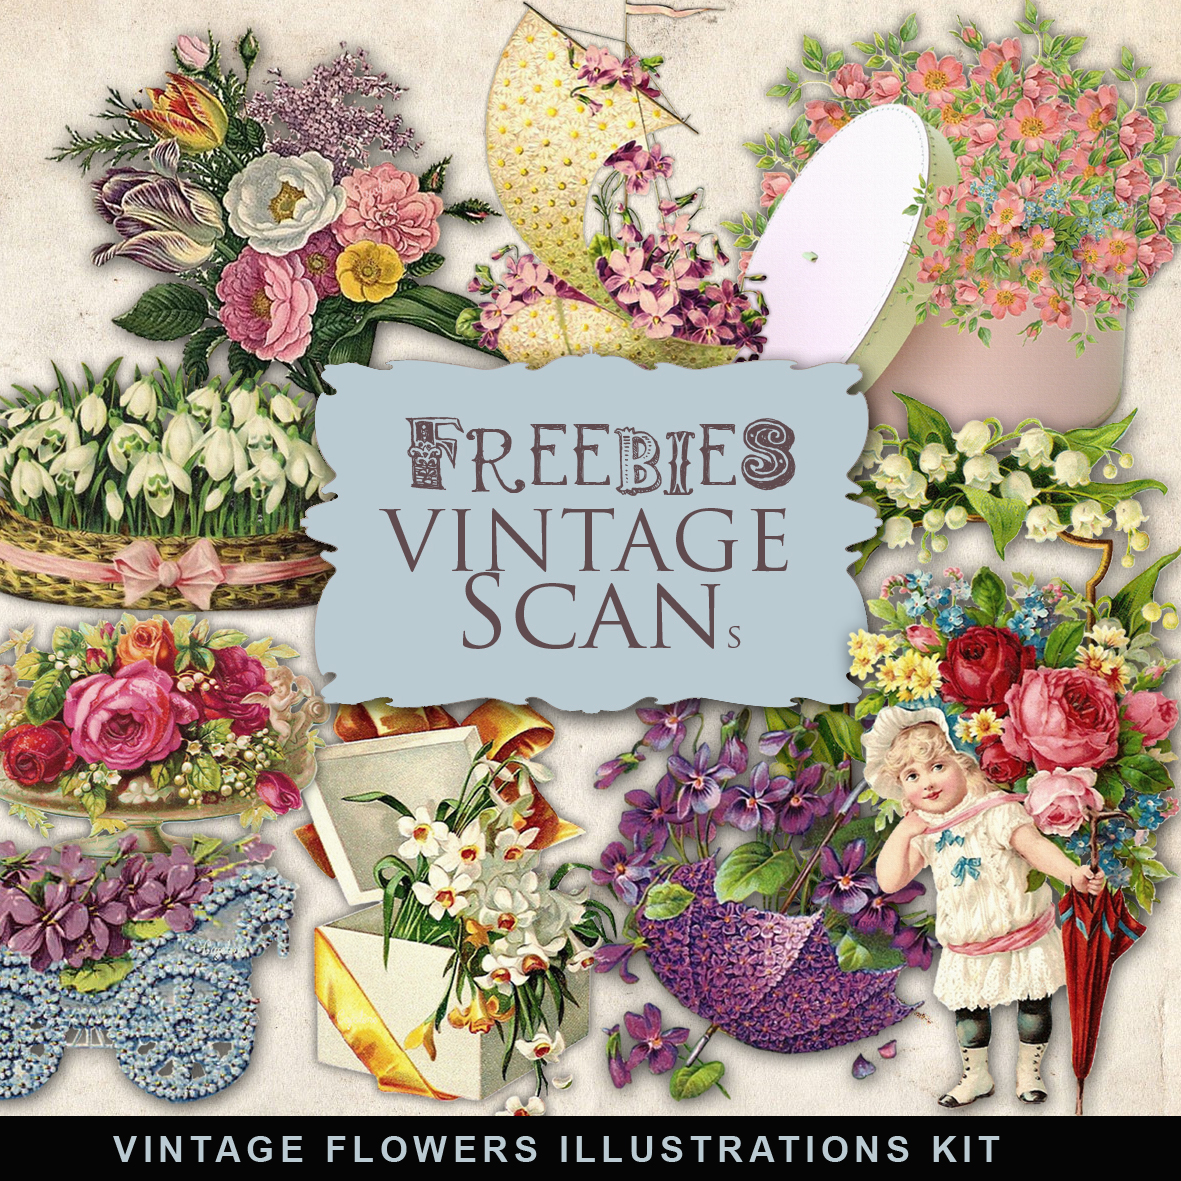 Vintage wedding scrapbook ideas - Maryhelen S Blog